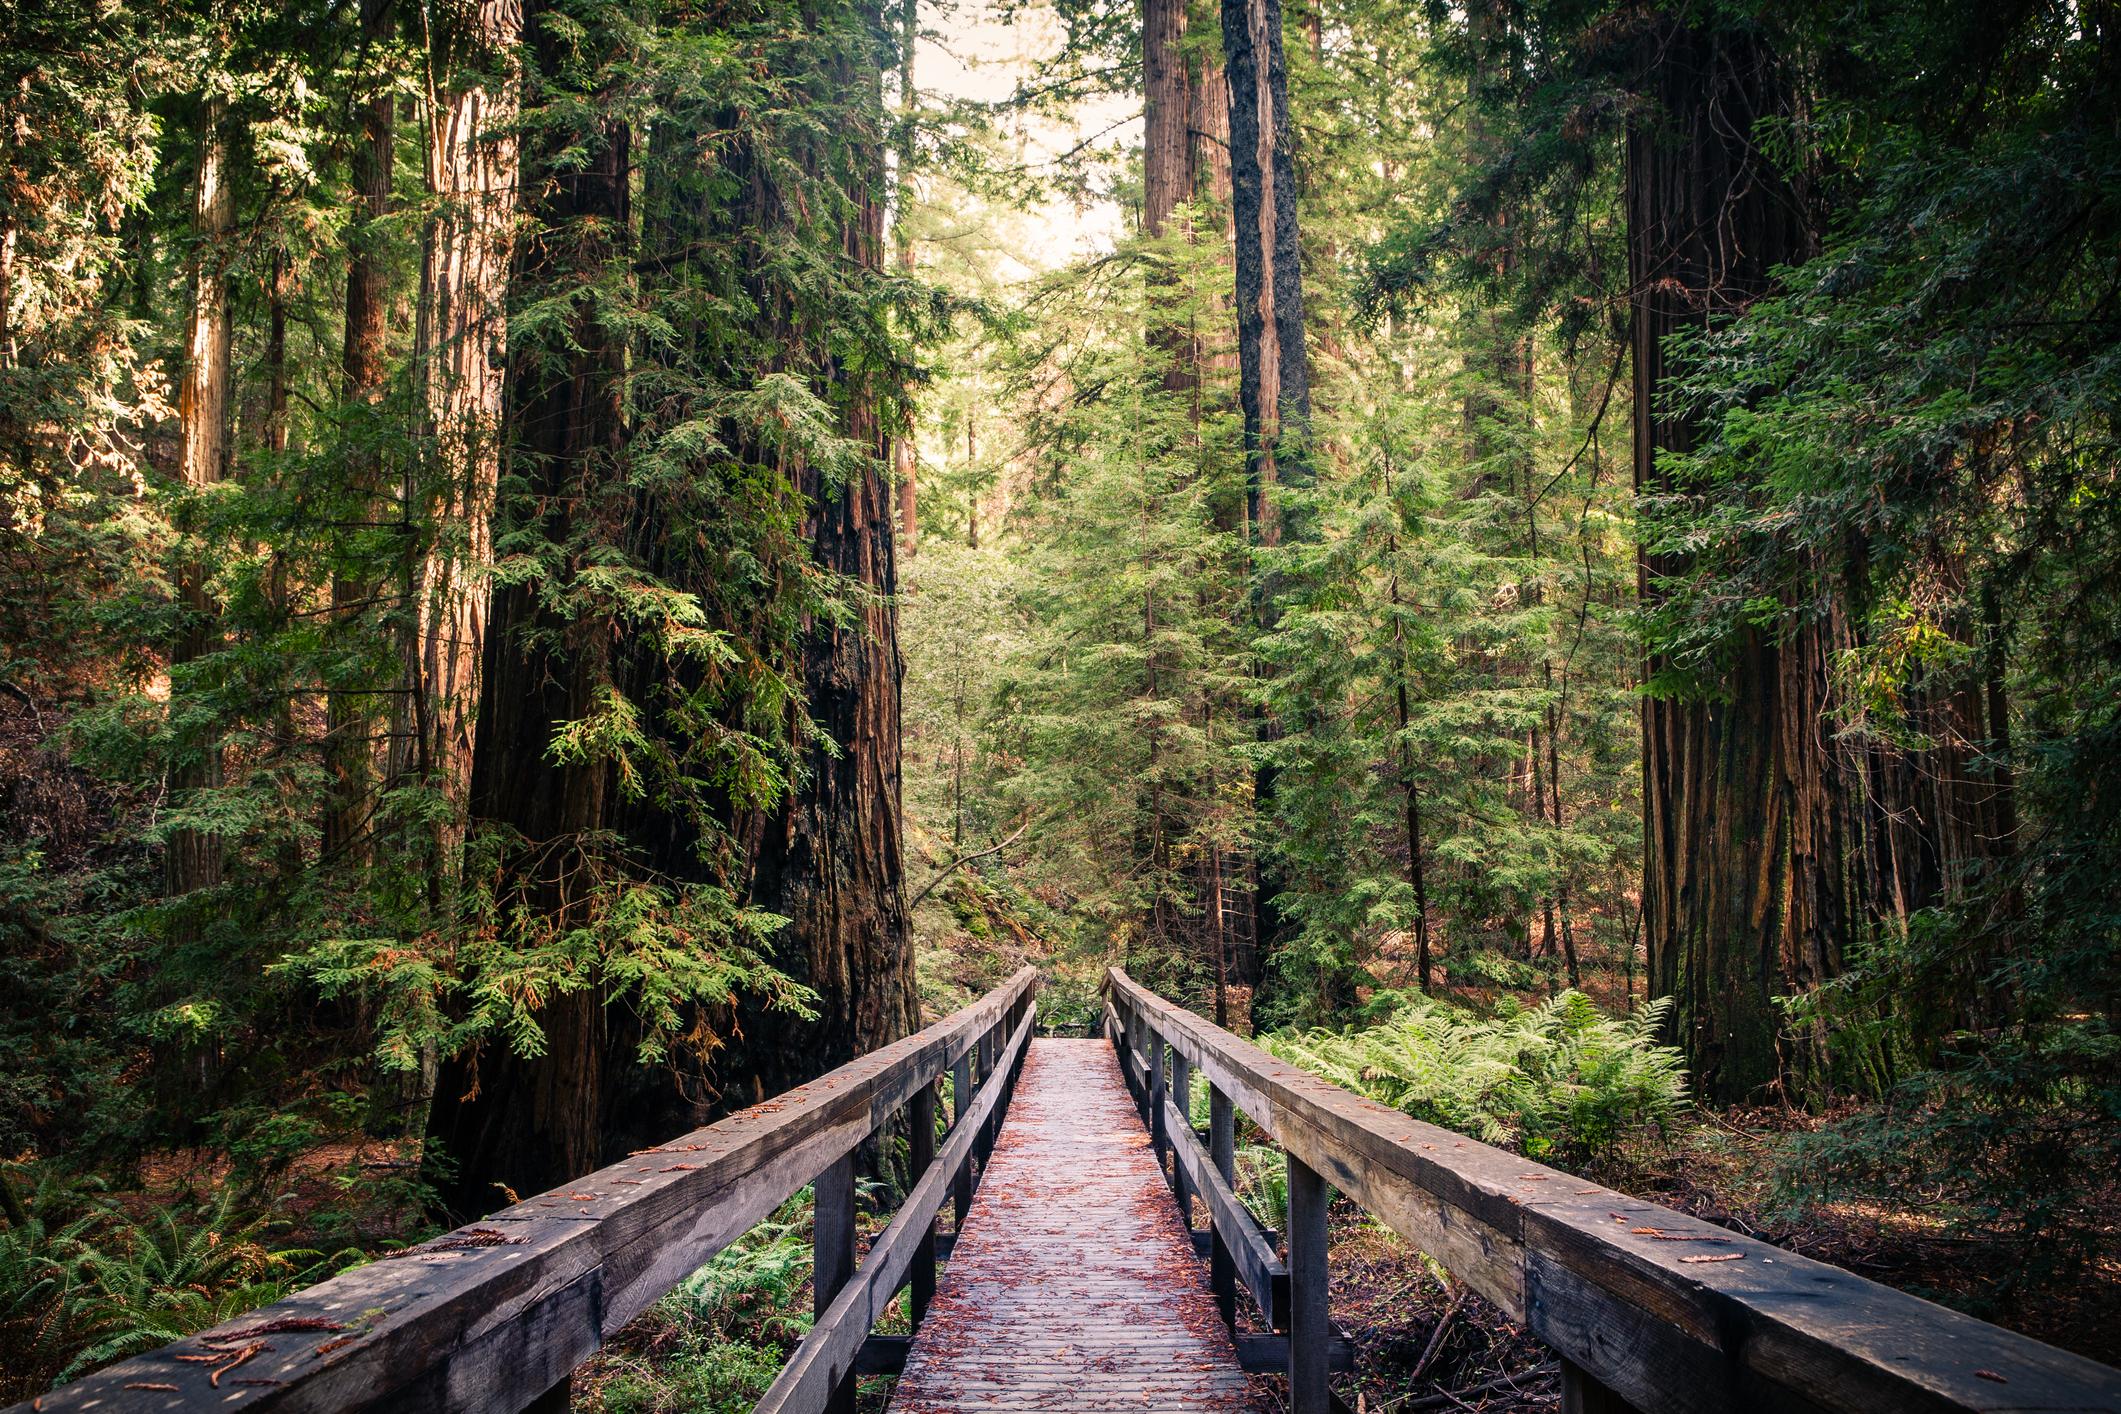 Trail through redwood forest.